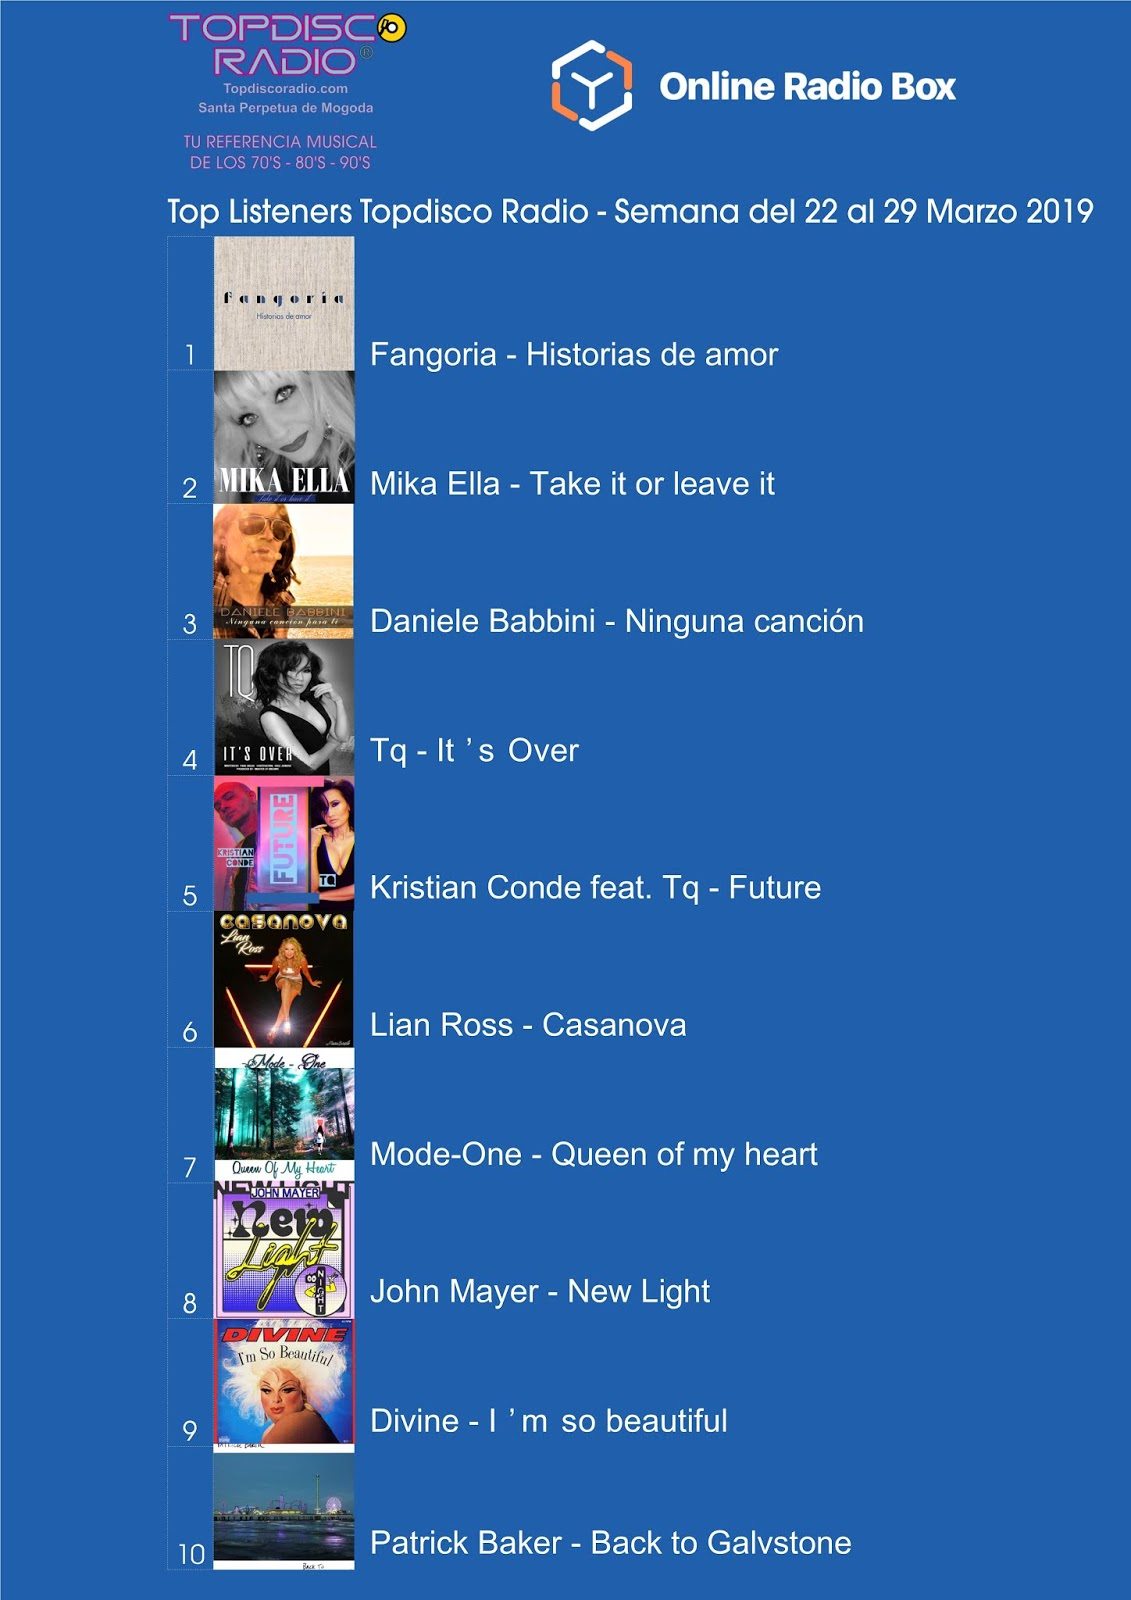 Top Listeners Semana del 22 al 29 Marzo 2019